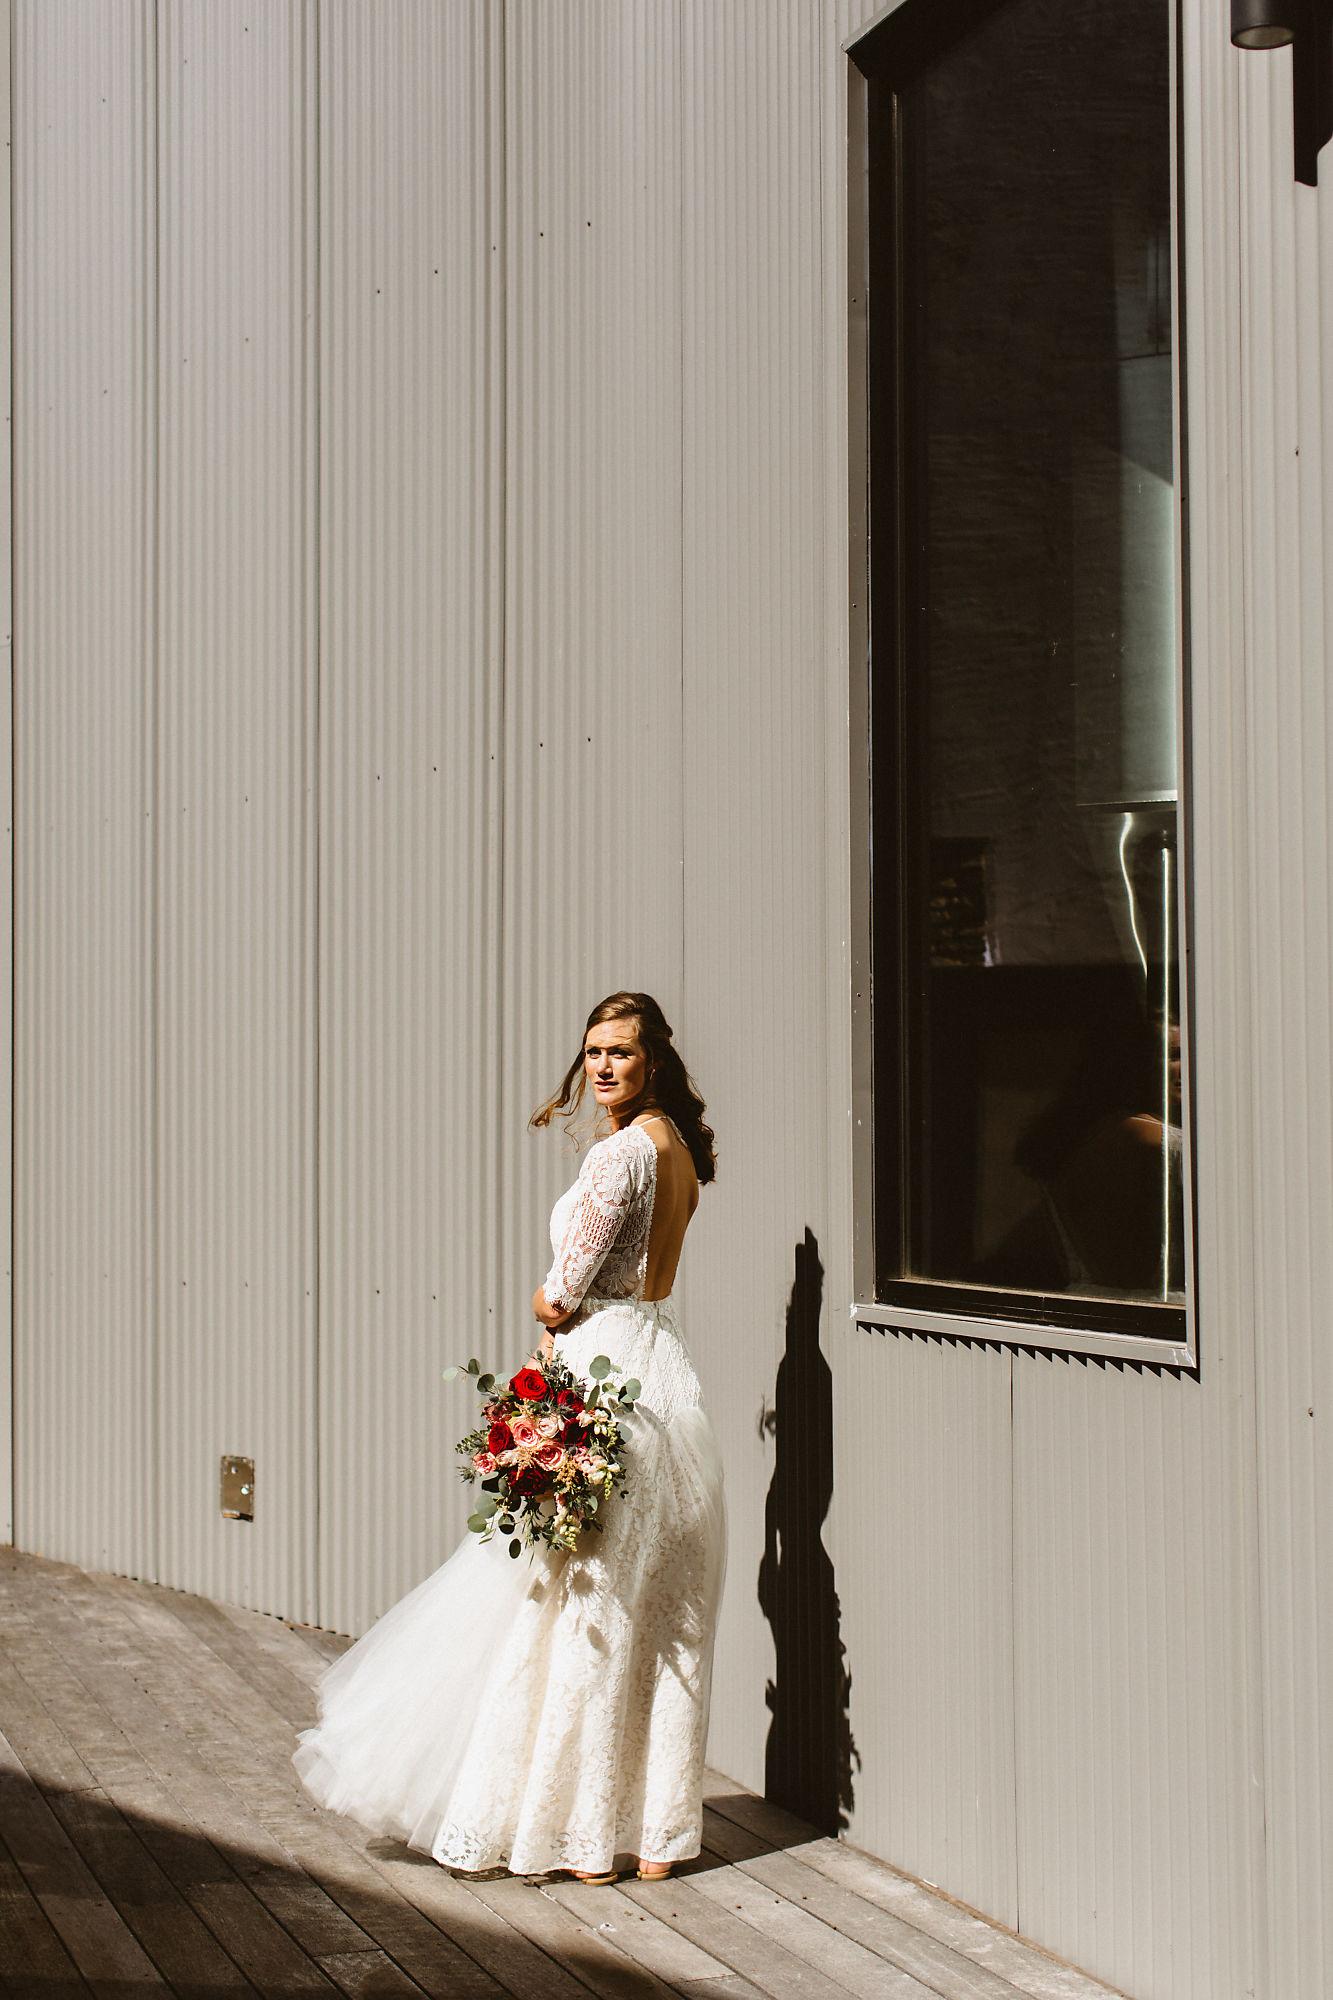 jessica_austin_oasis_brewery_wedding_photos135127.jpg